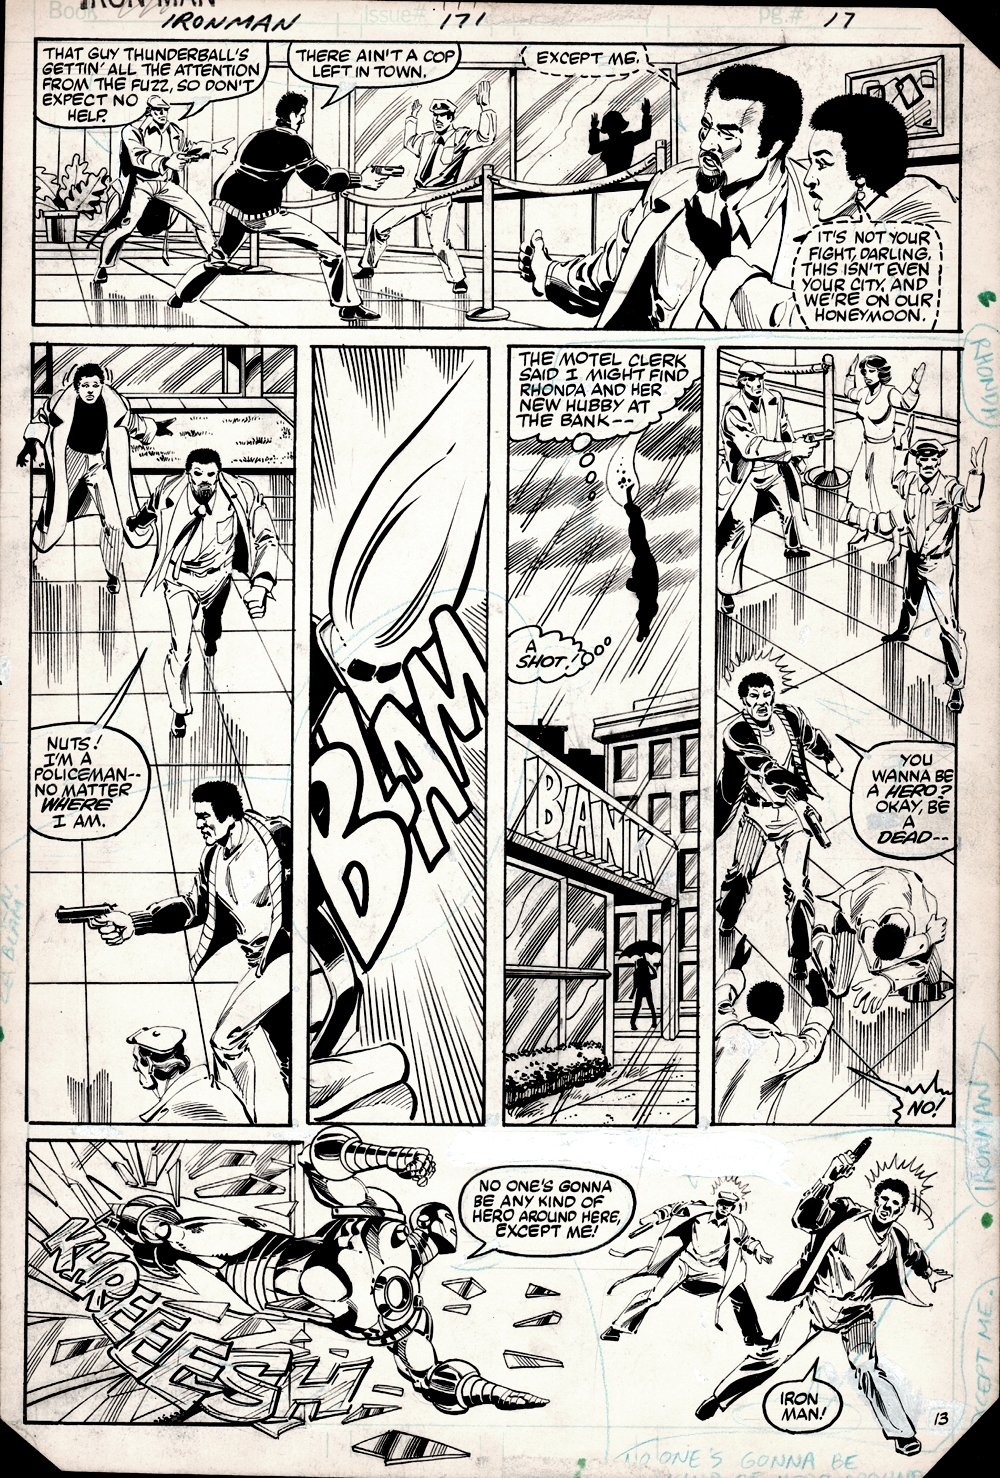 Iron Man #171 p 13 (2nd Jim Rhodes As Iron Man, Battle!) 1983